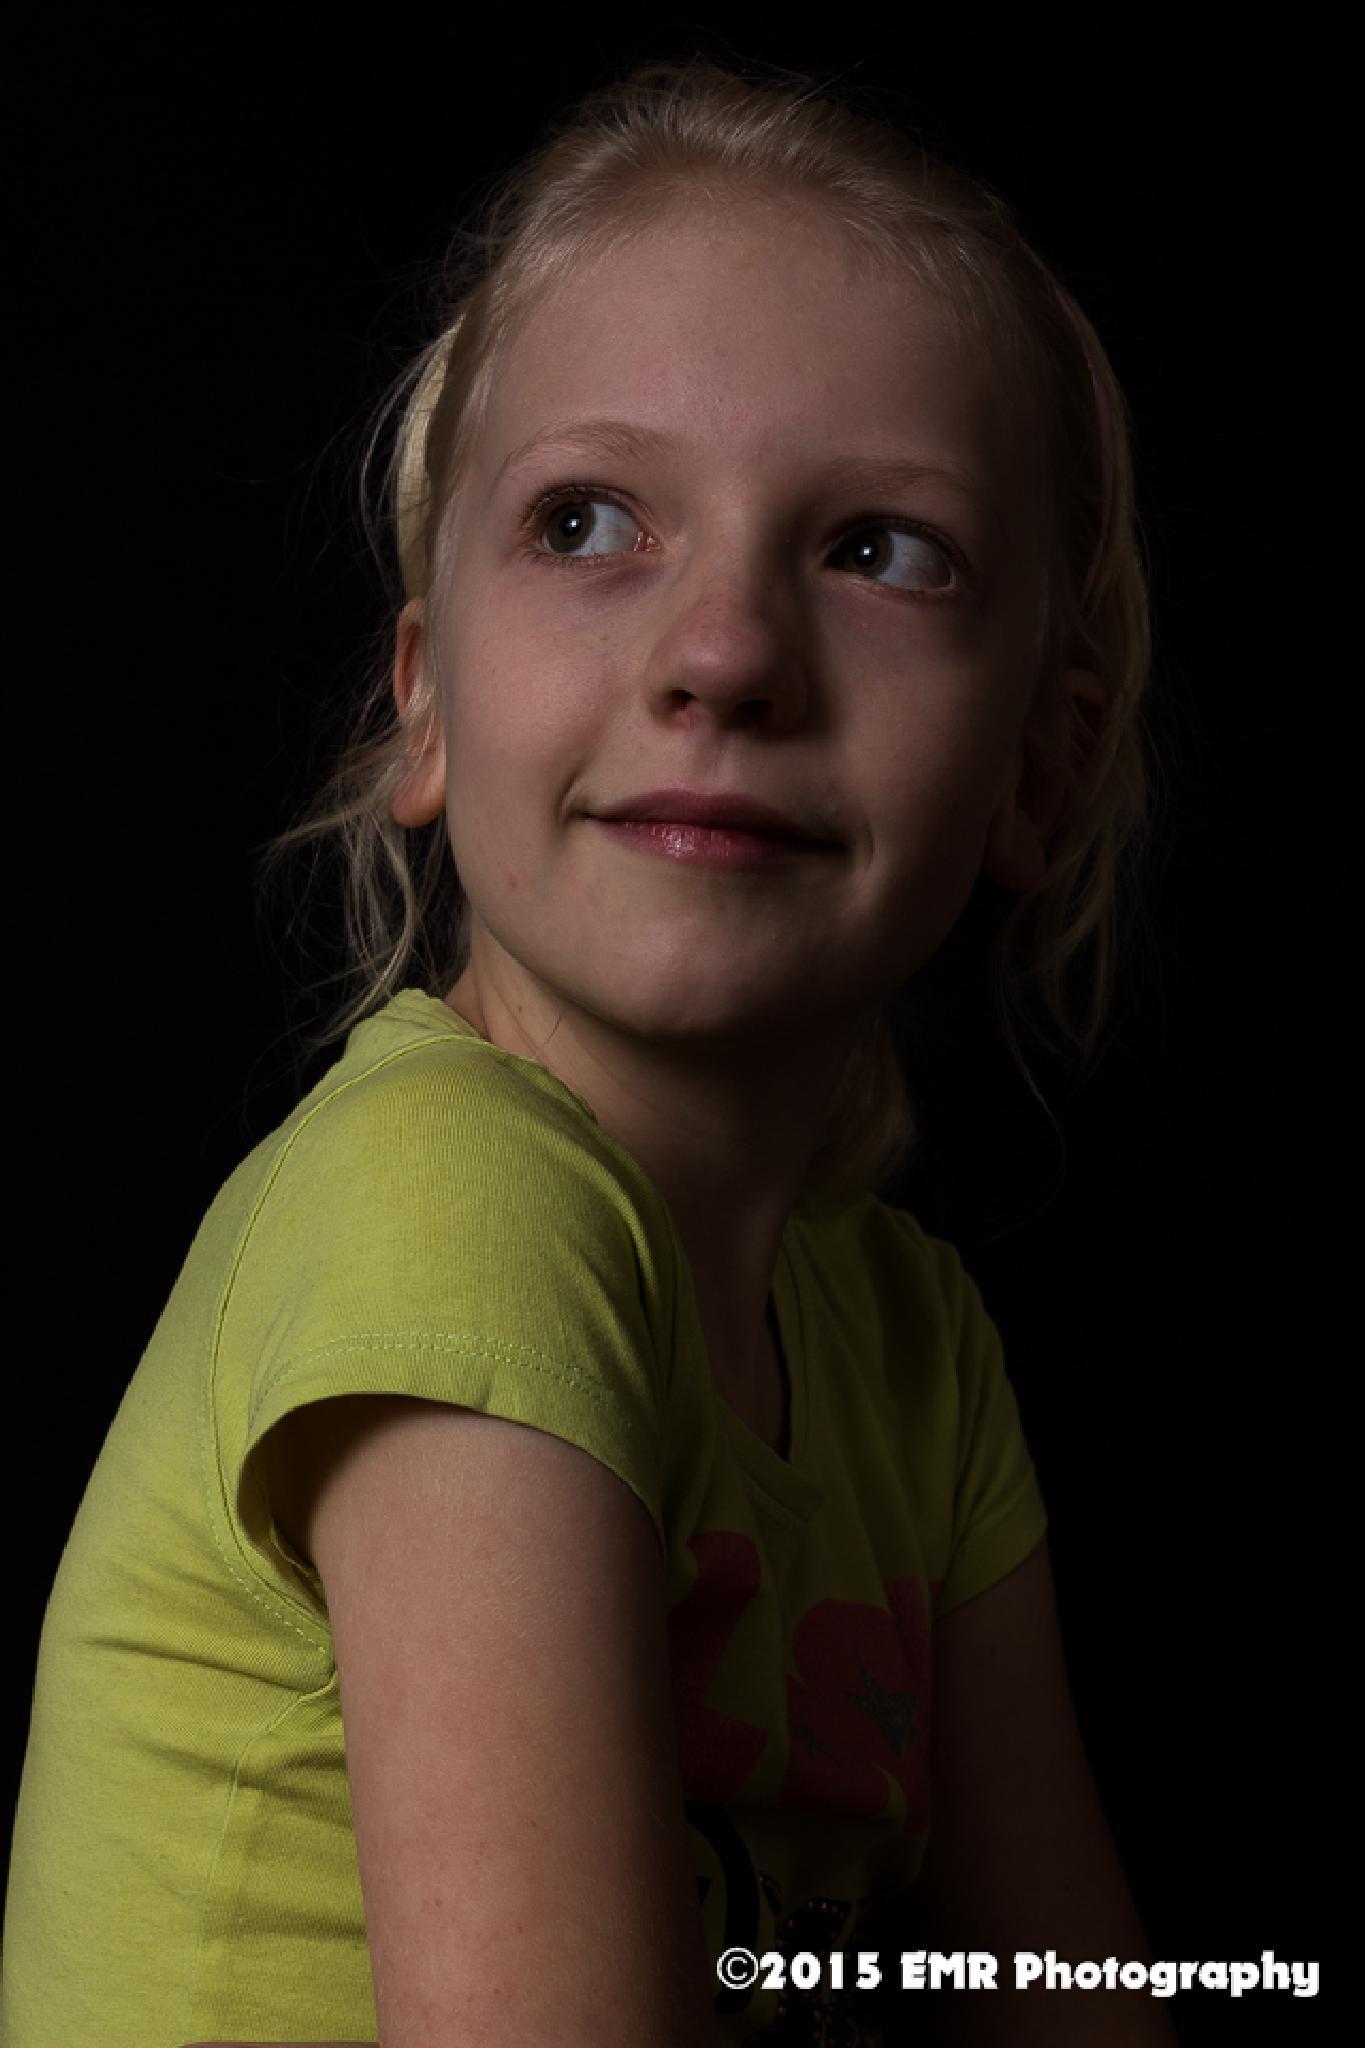 Sabine by EMR Photography & Fotomodel Marijn